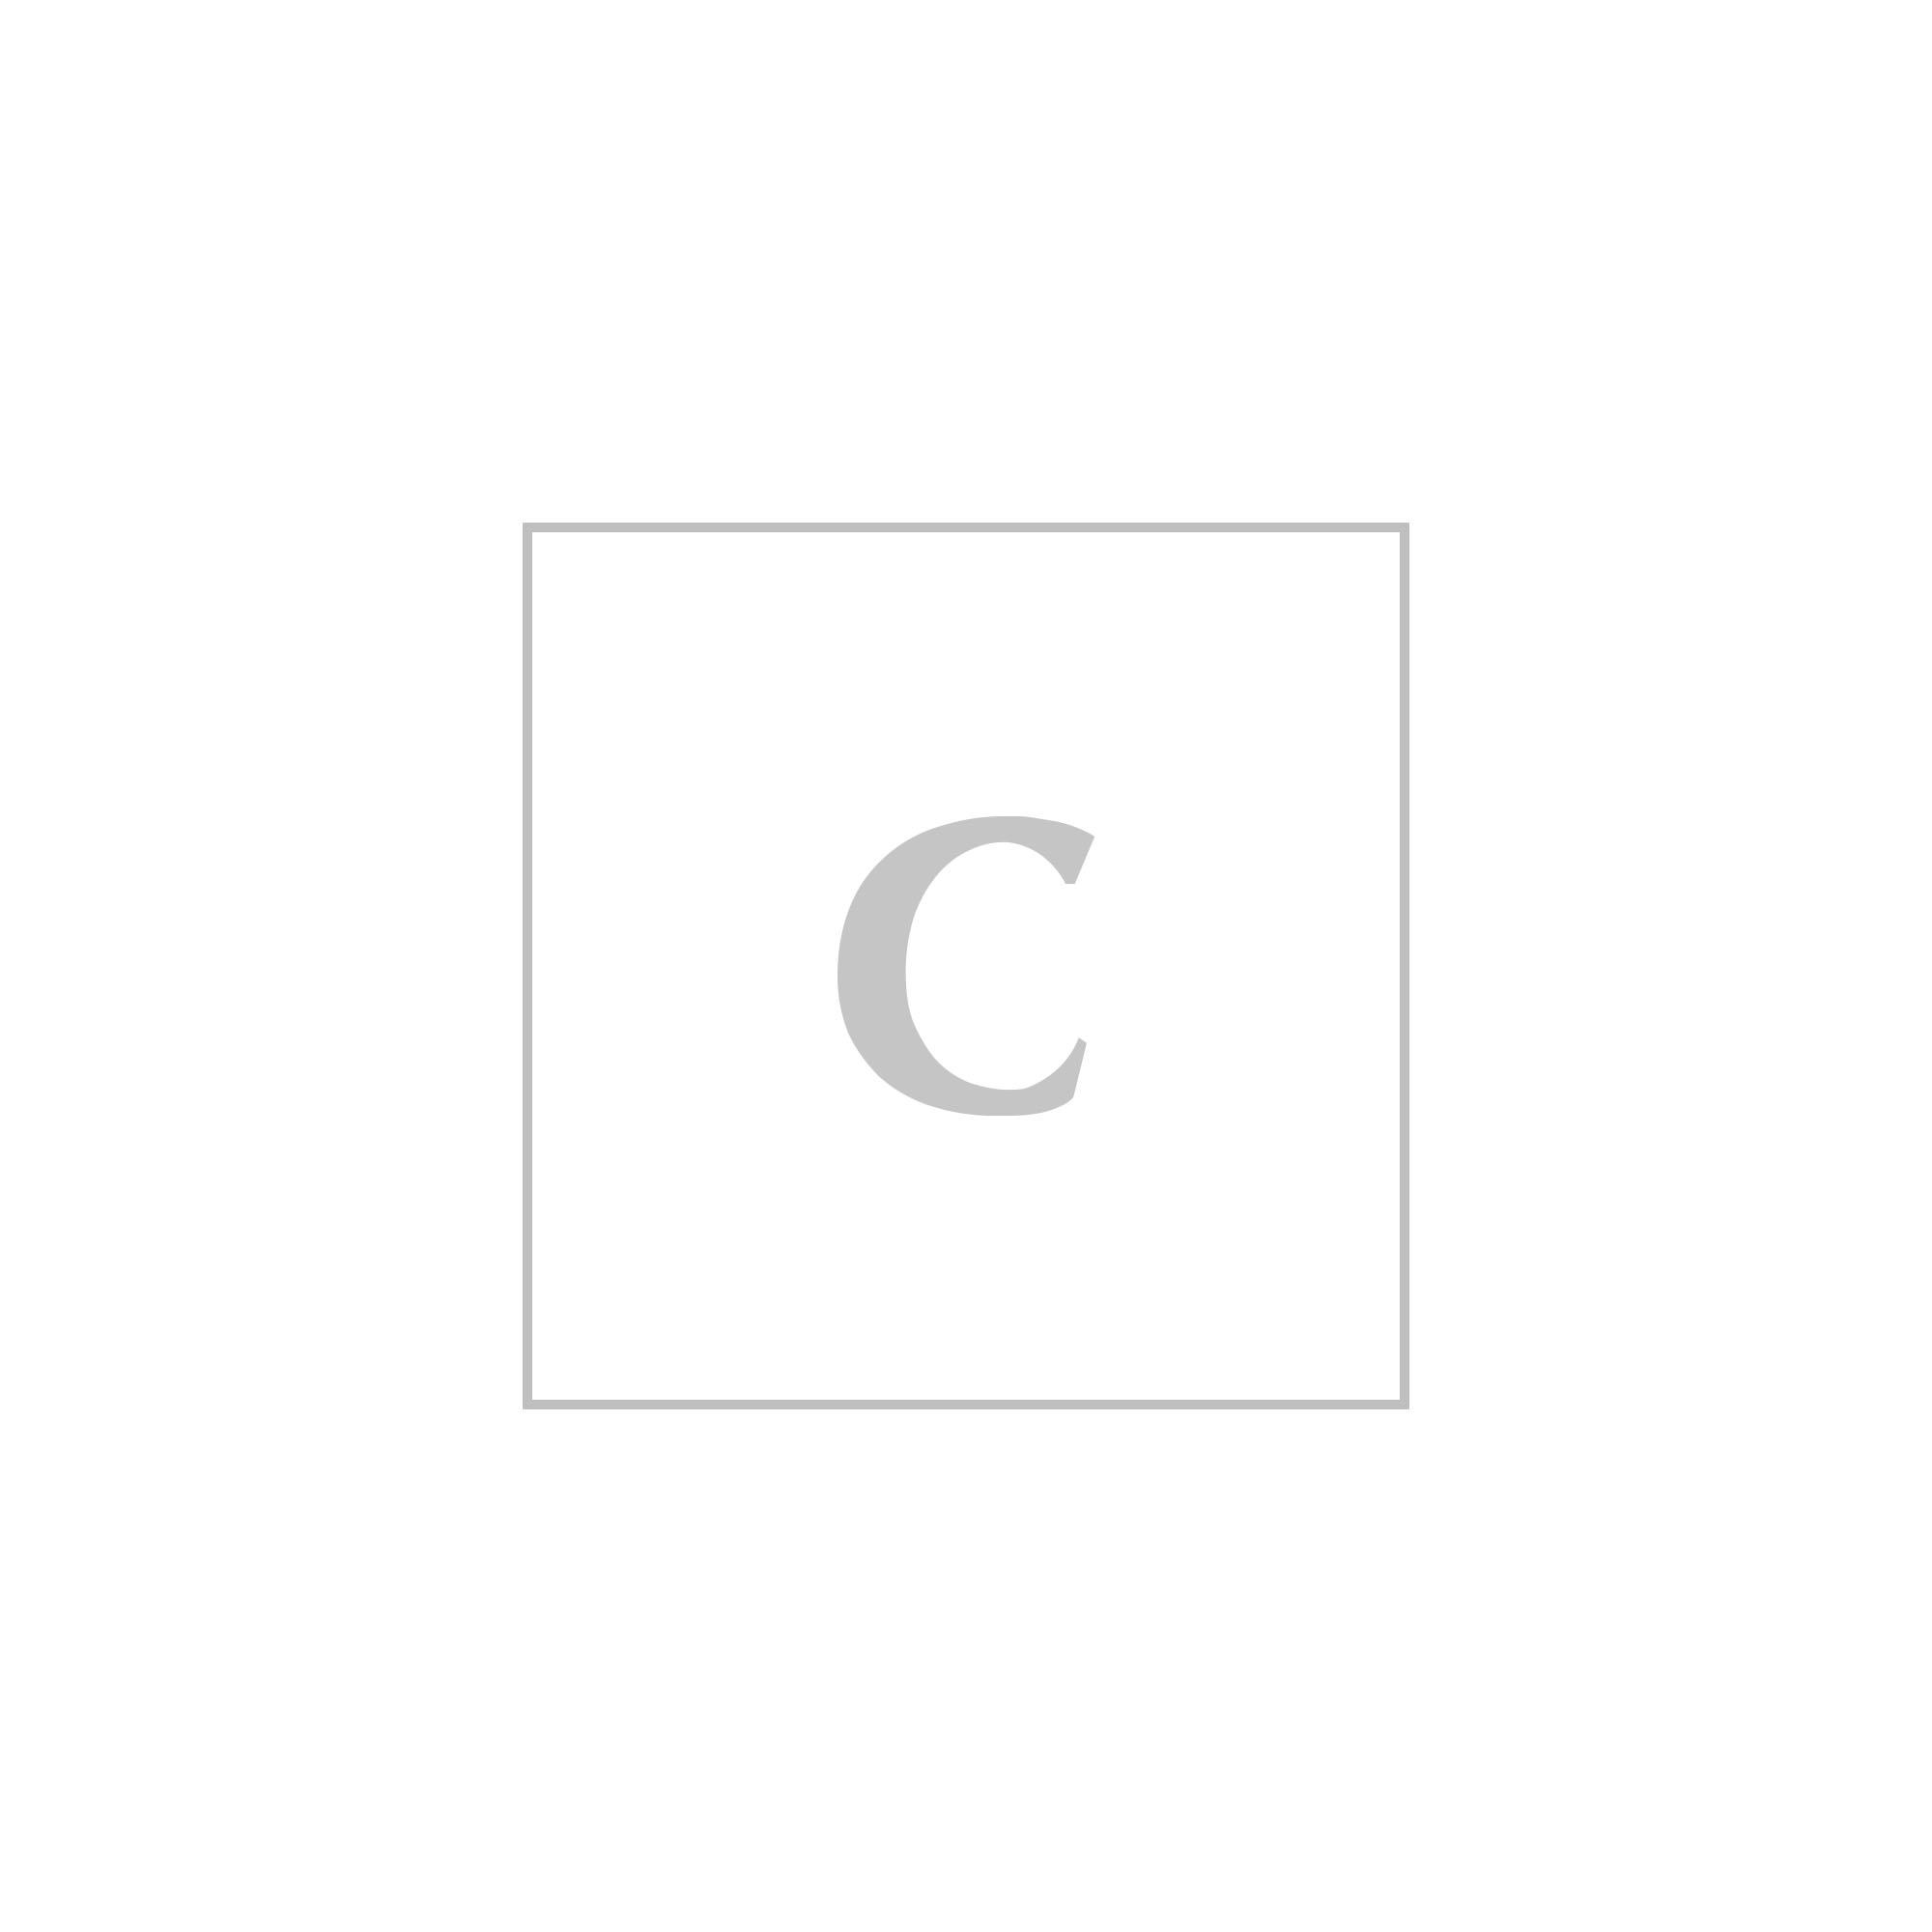 Dolce & gabbana sandalo zeppa vernice gloss keira